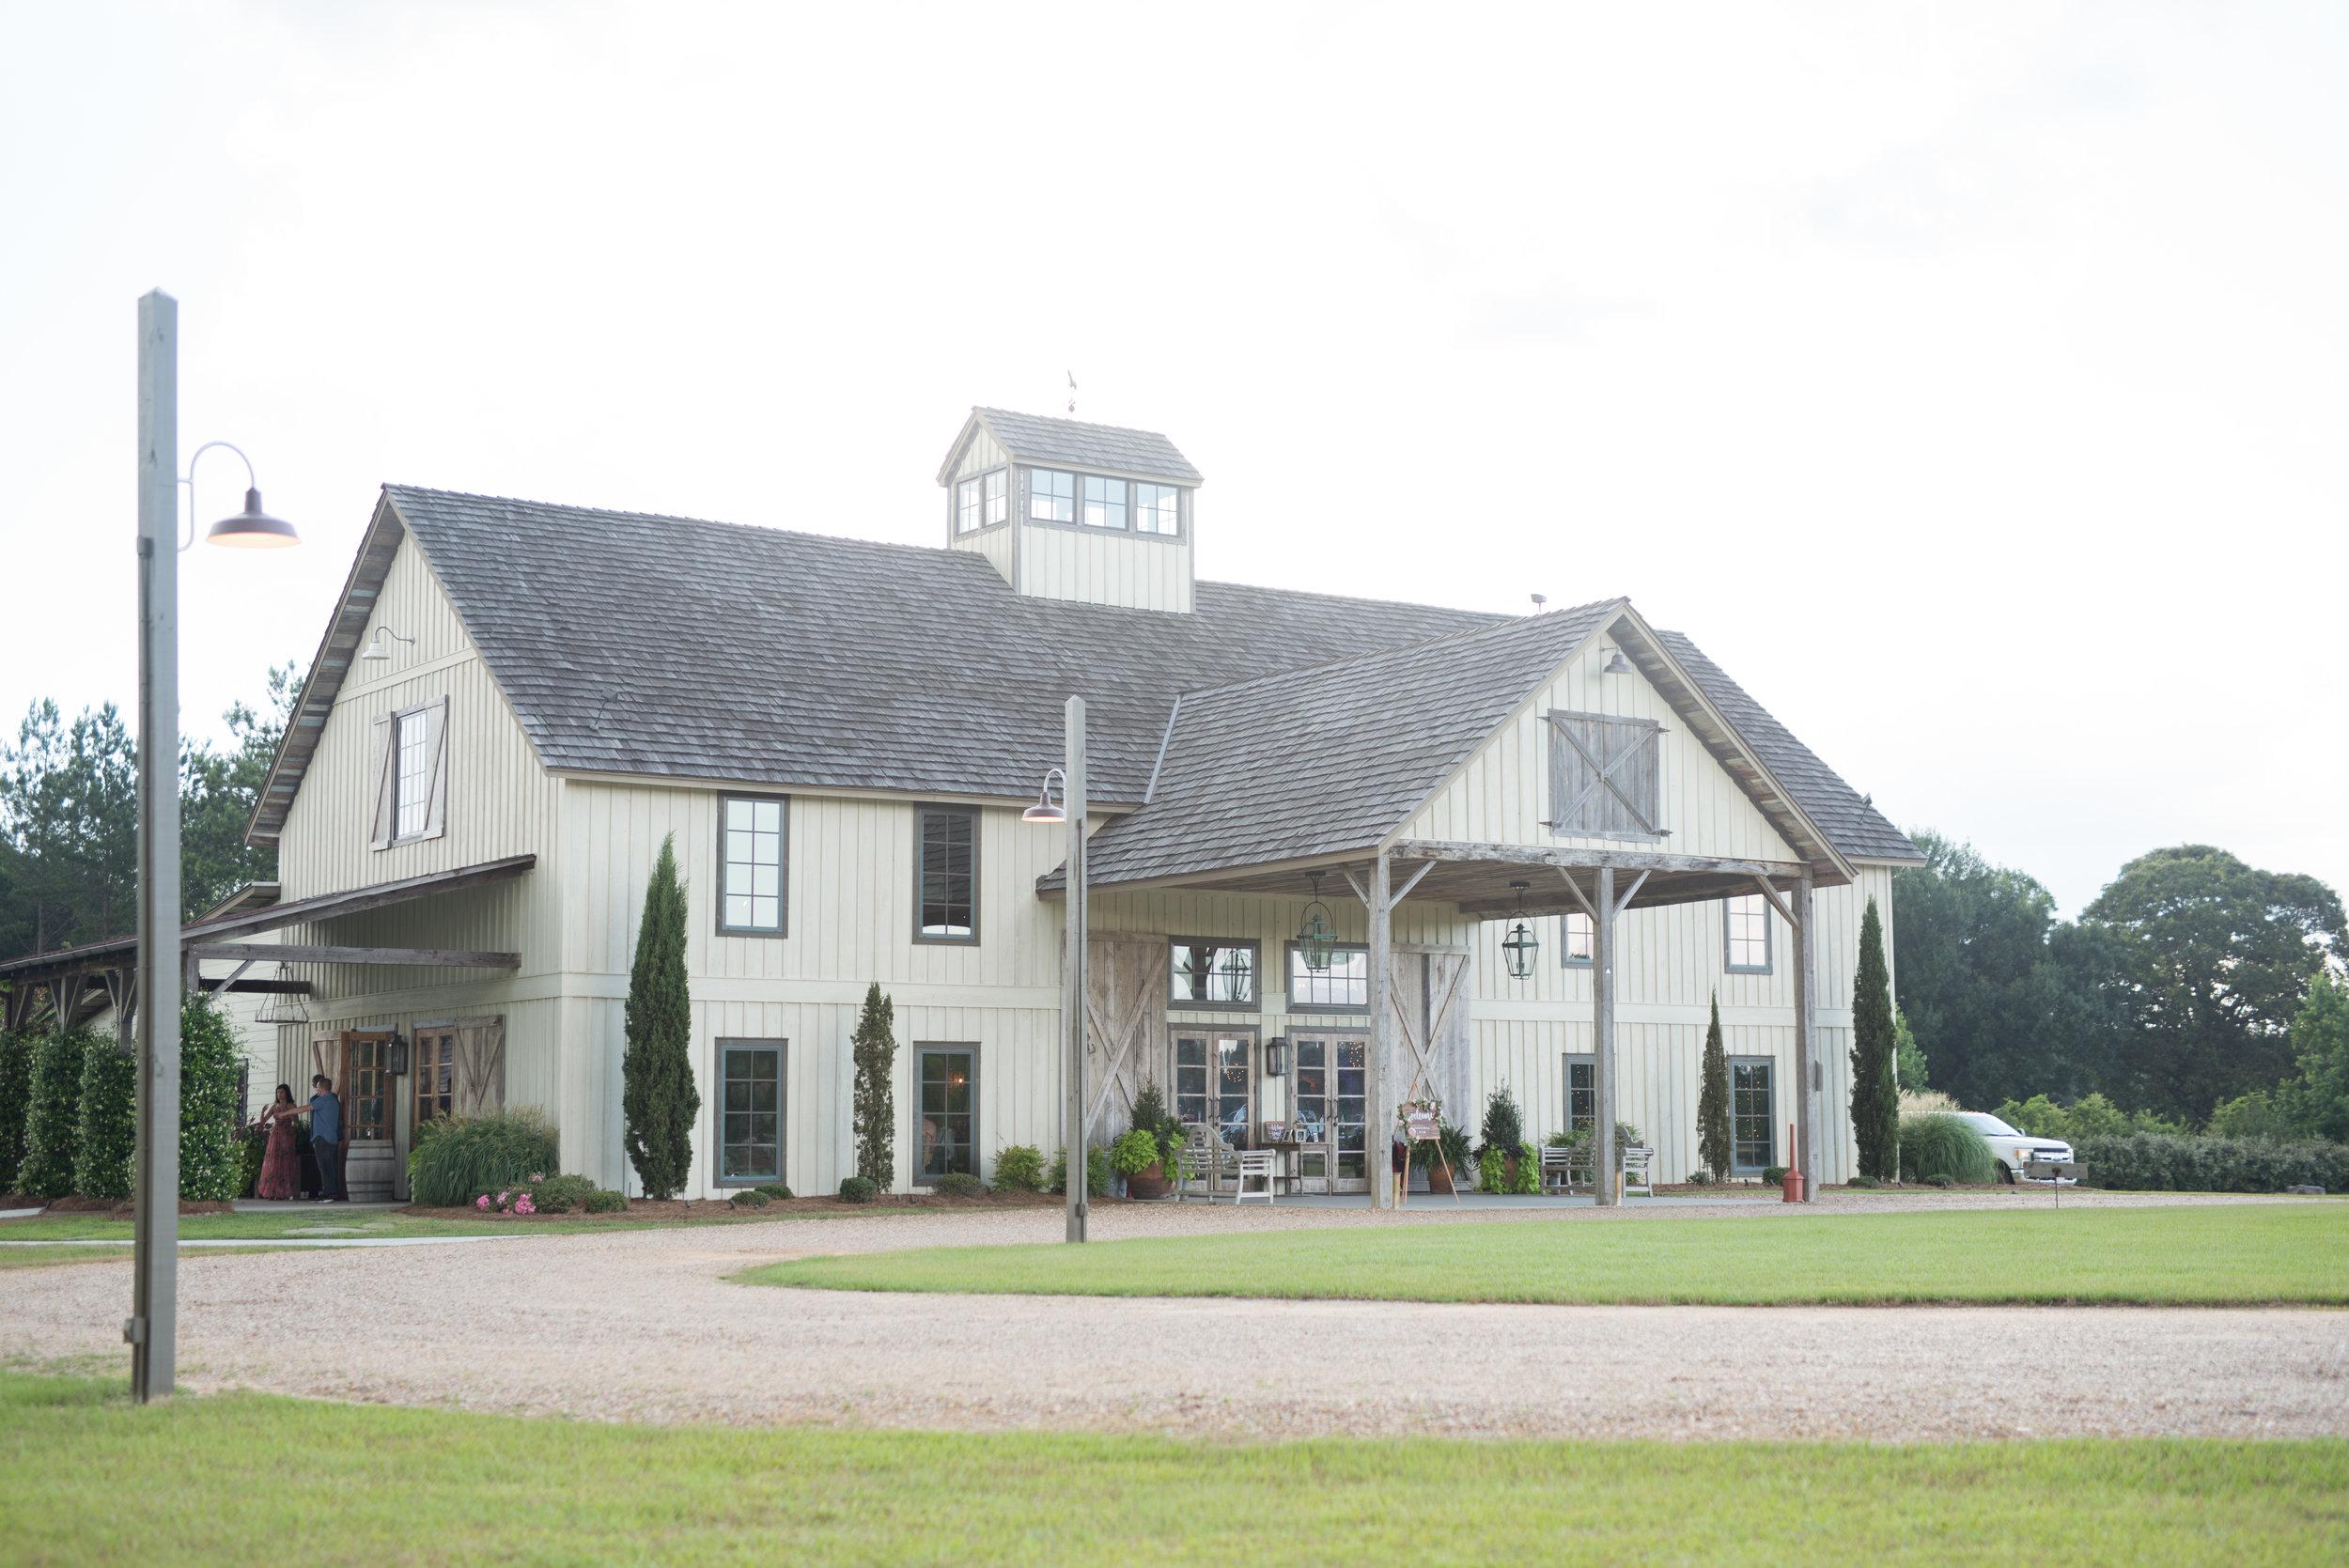 The Barn at Bridlewood wedding in Hattiesburg, Mississippi (MS) in June  Wedding  venue